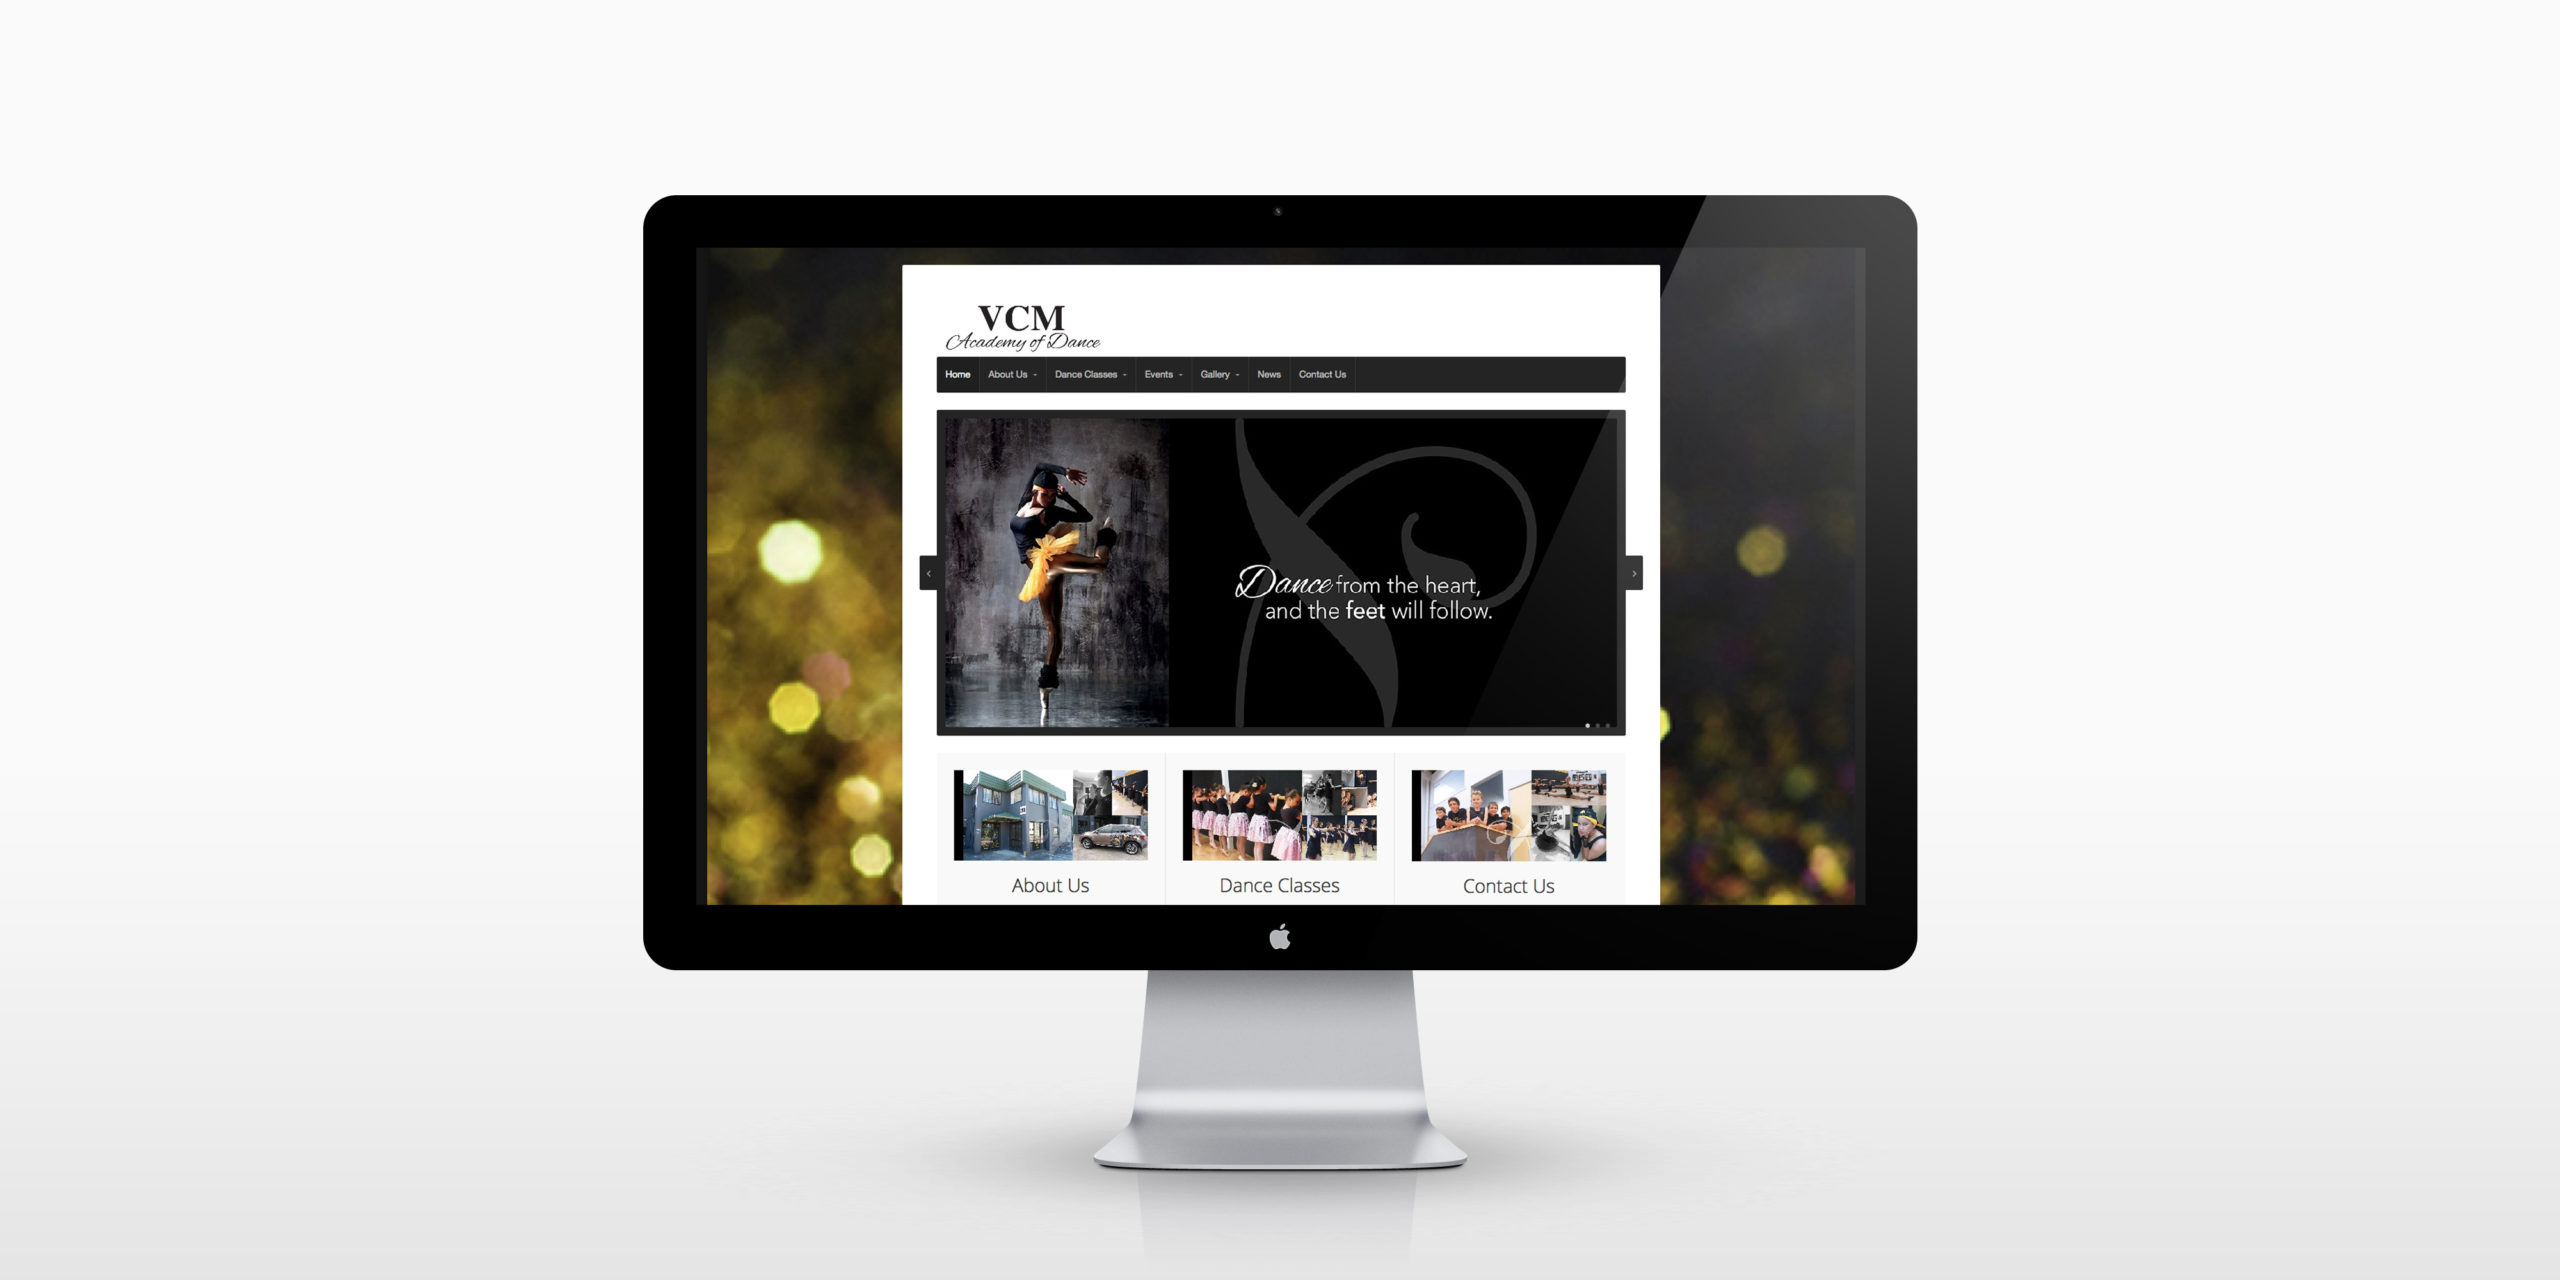 VCM Academy of Dance website homepage